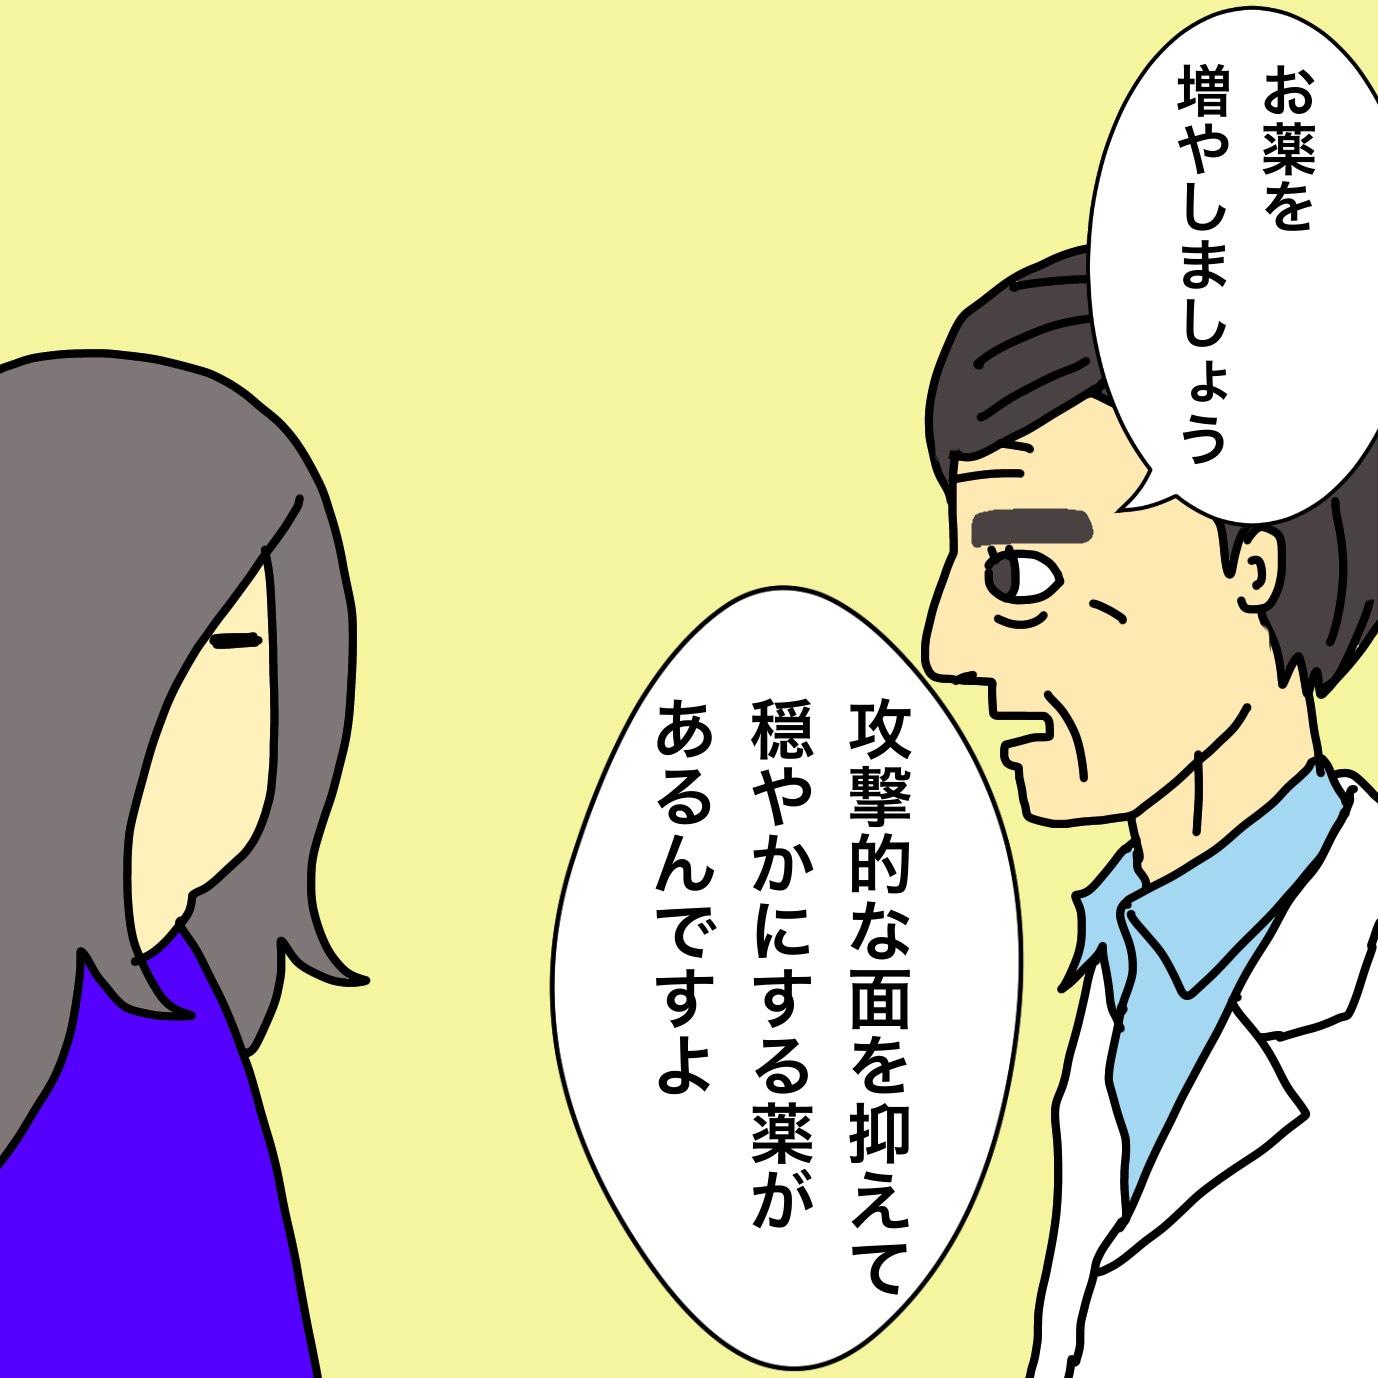 Image-17.jpeg